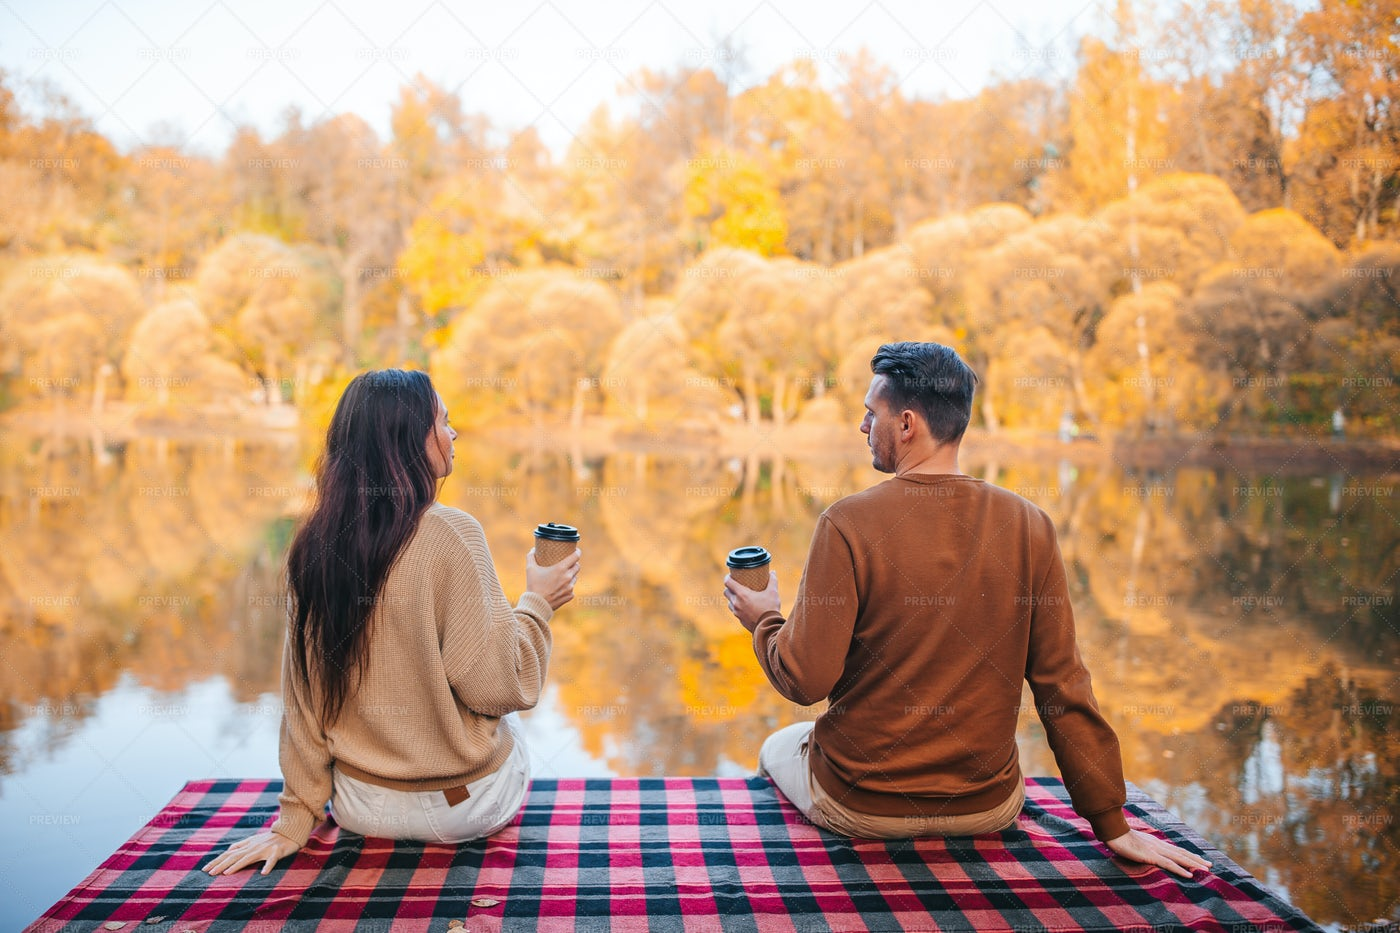 Couple In Autumn Day: Stock Photos